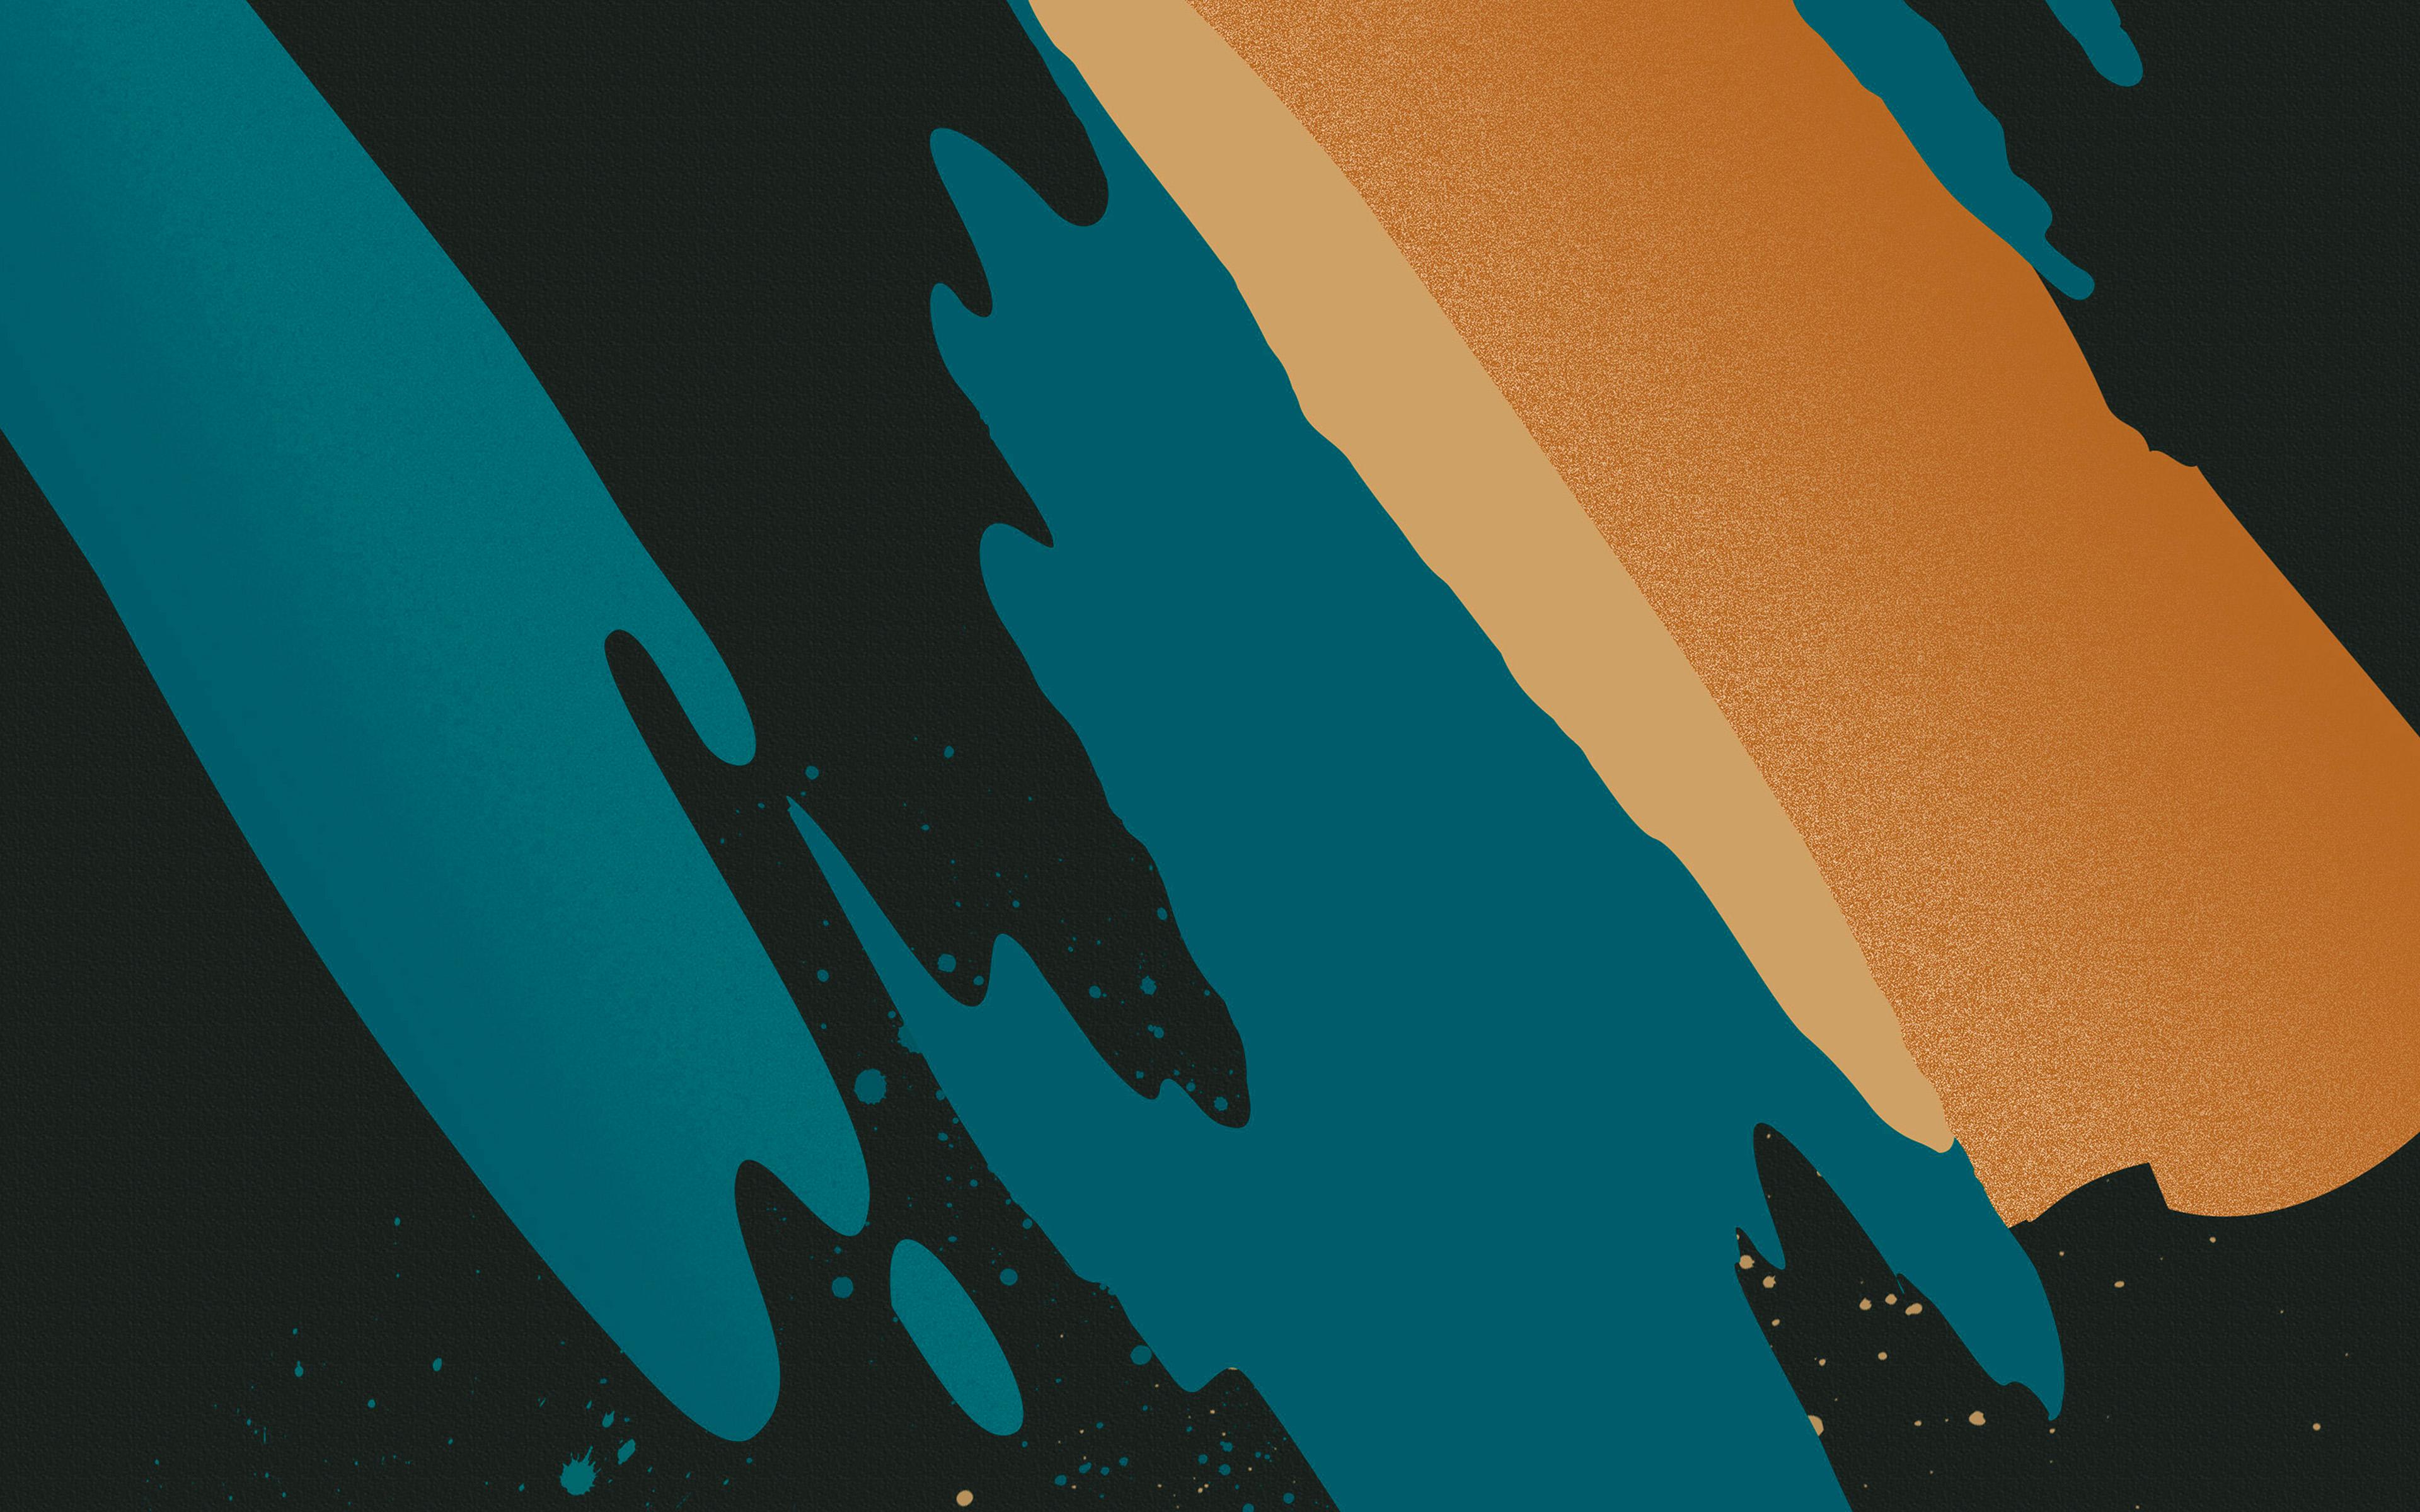 Abstract Macbook Pro Wallpaper 4k 3069361 Hd Wallpaper Backgrounds Download